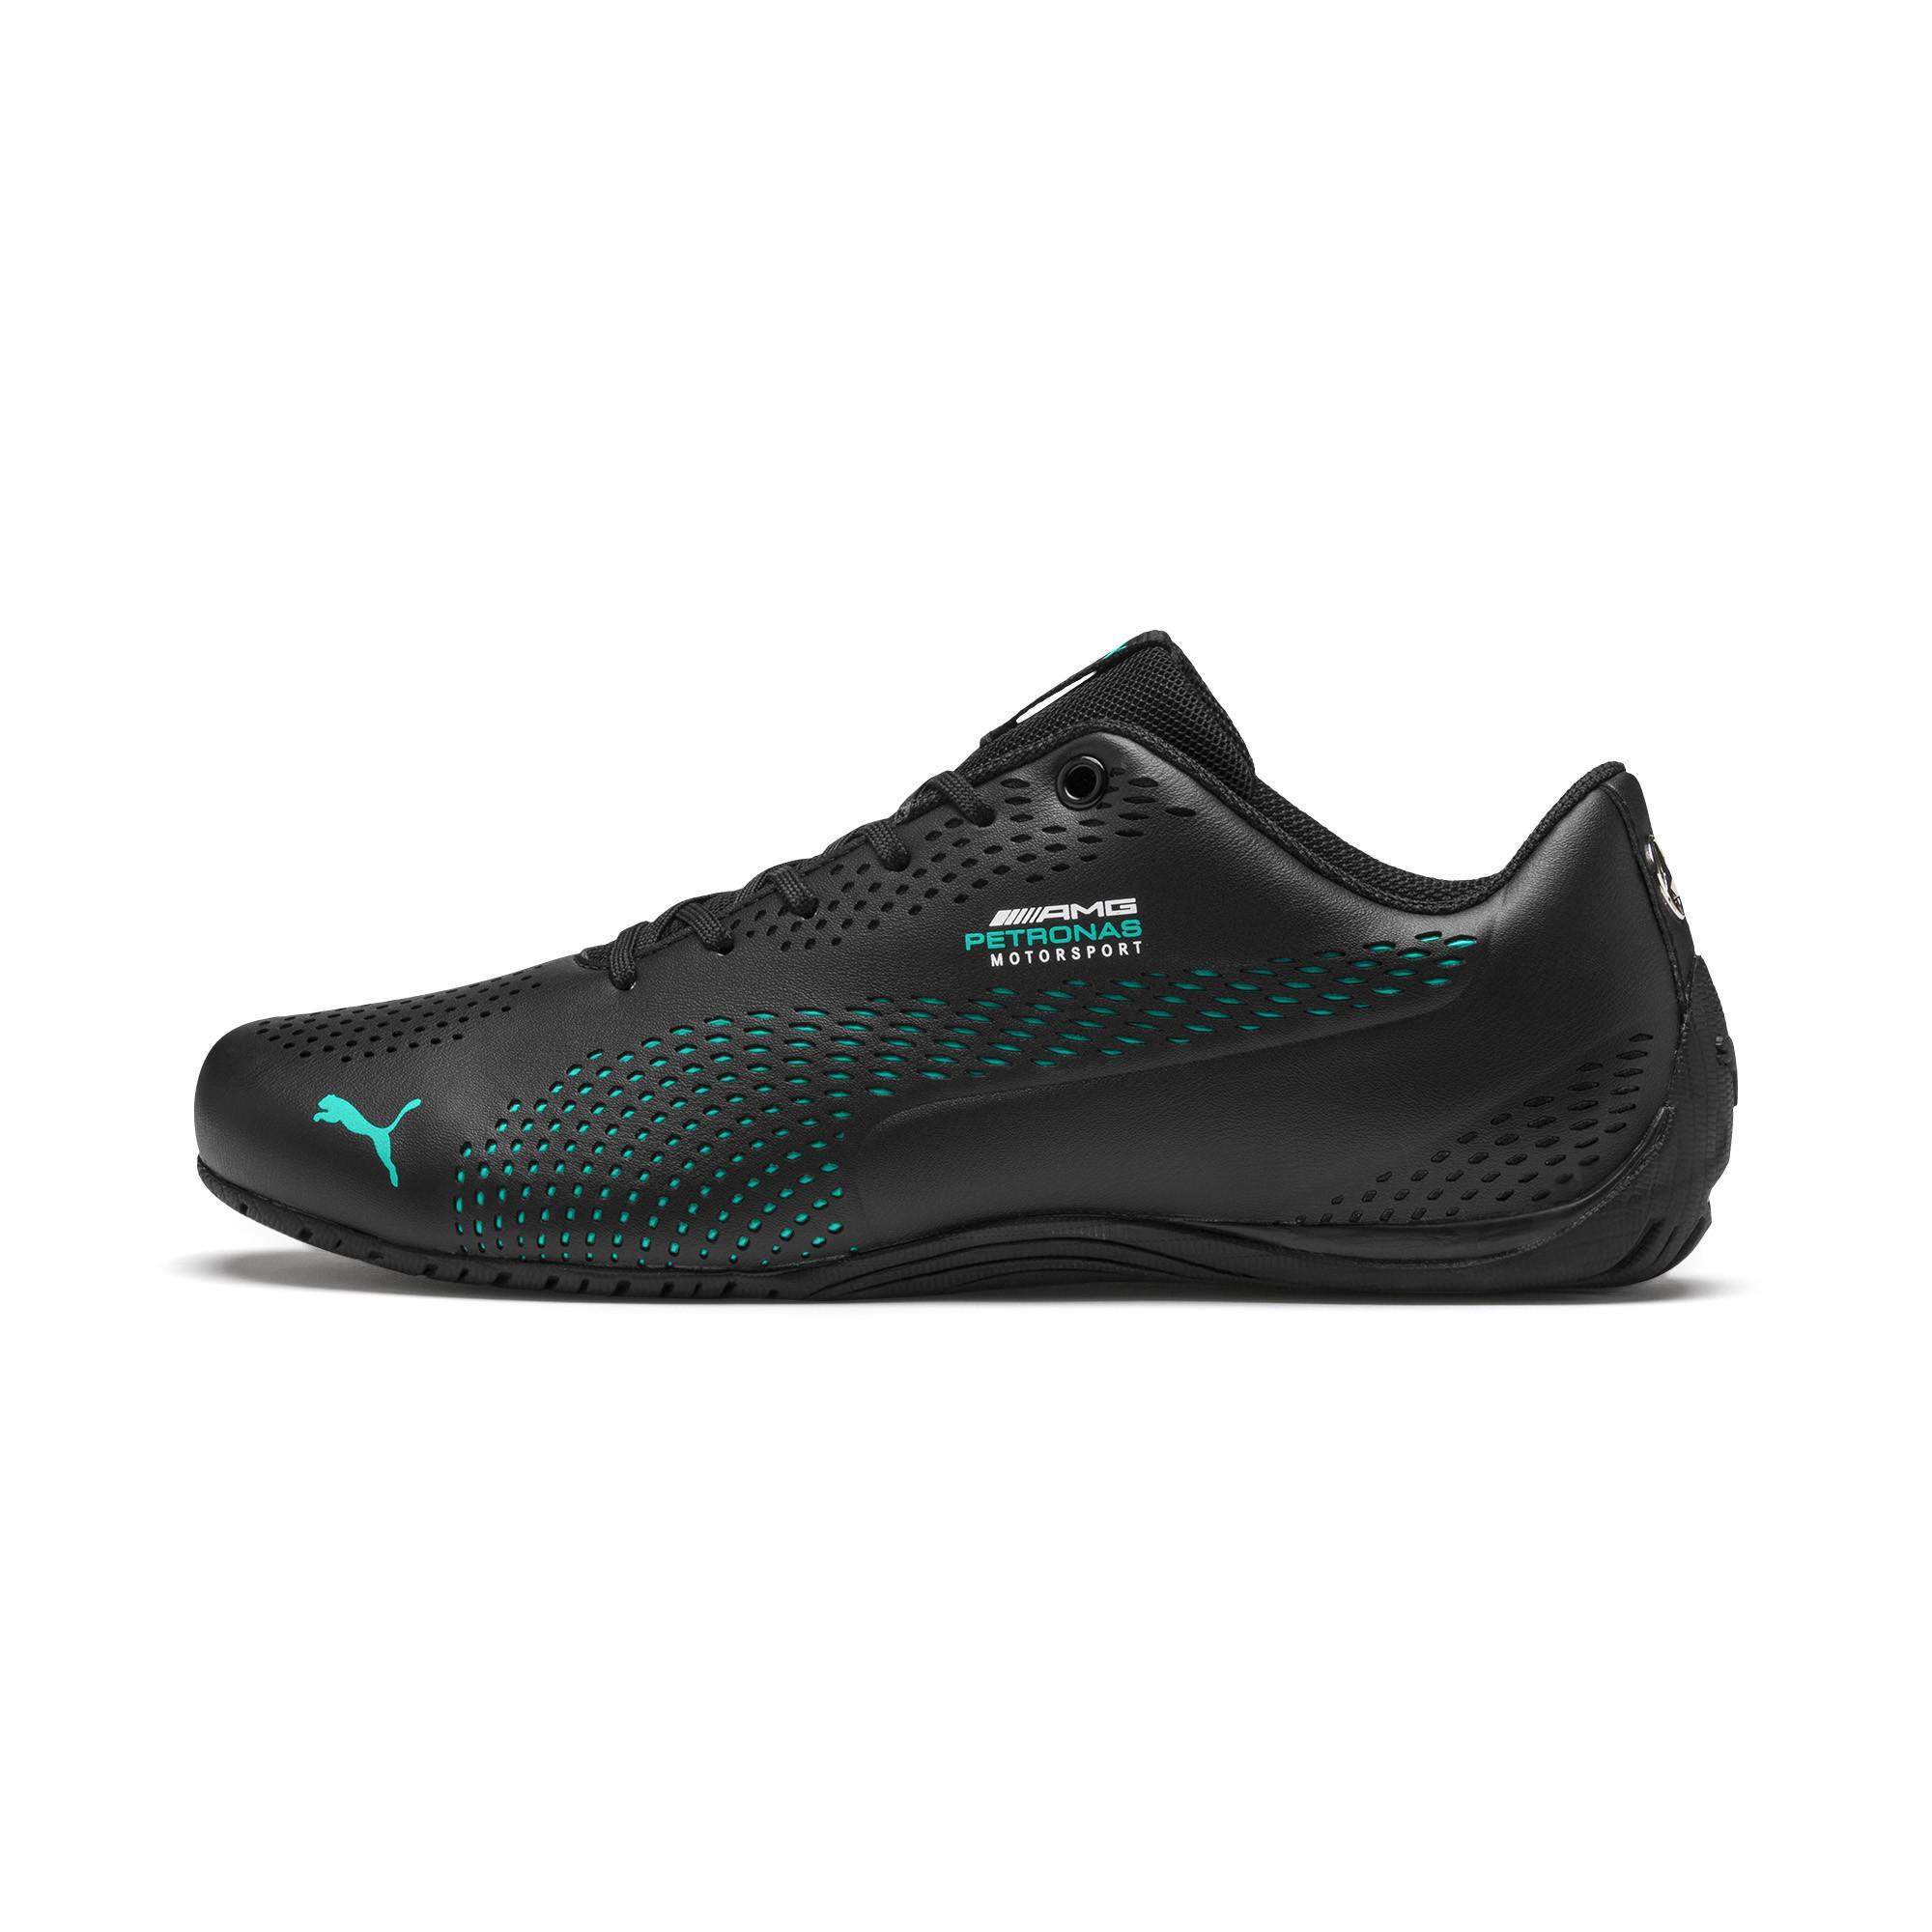 Mercedes Amg Petronas Drift Cat 5 Ultra Ii Men's Shoes